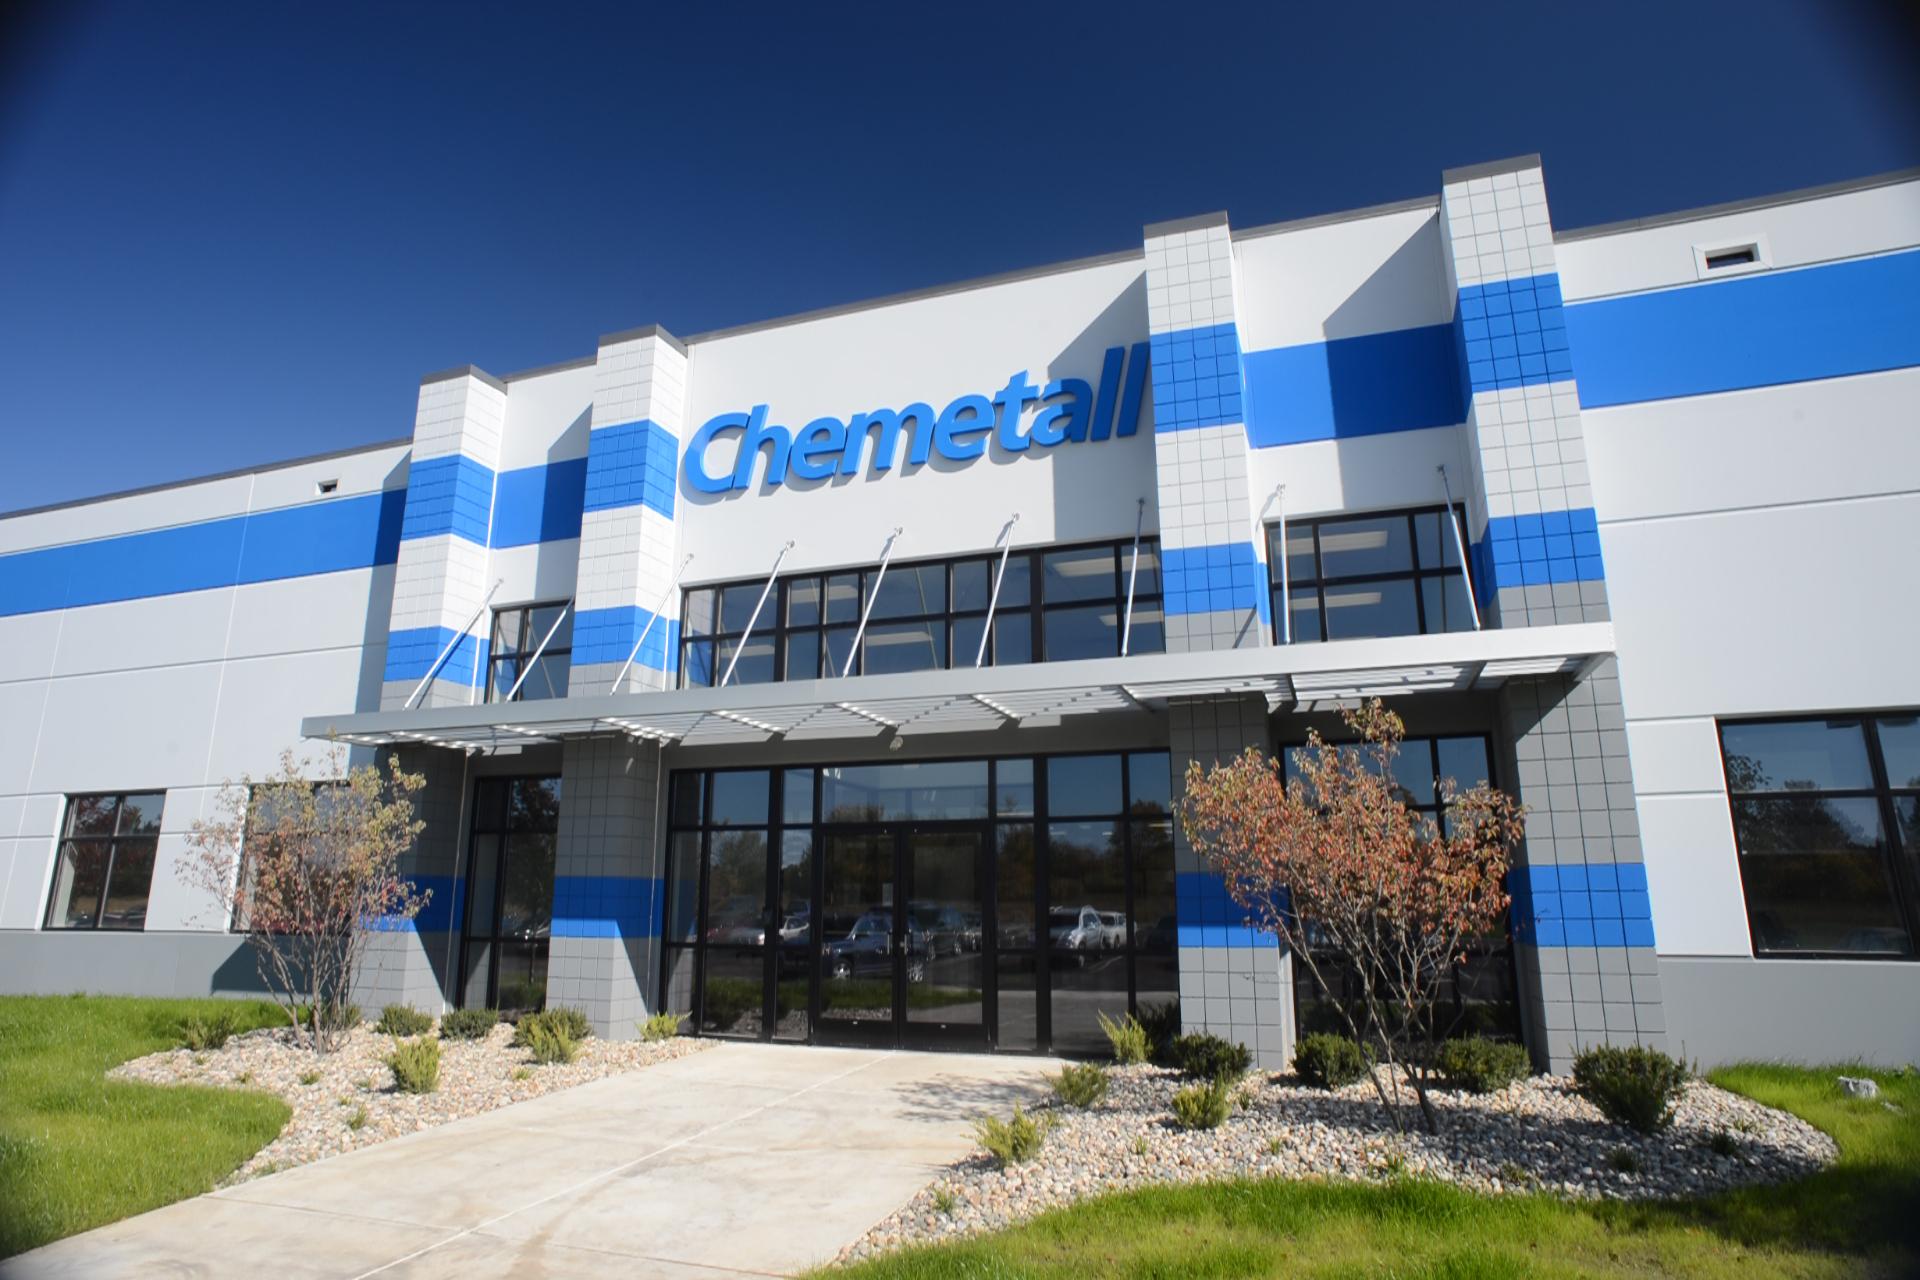 Chemetall Group - News Details